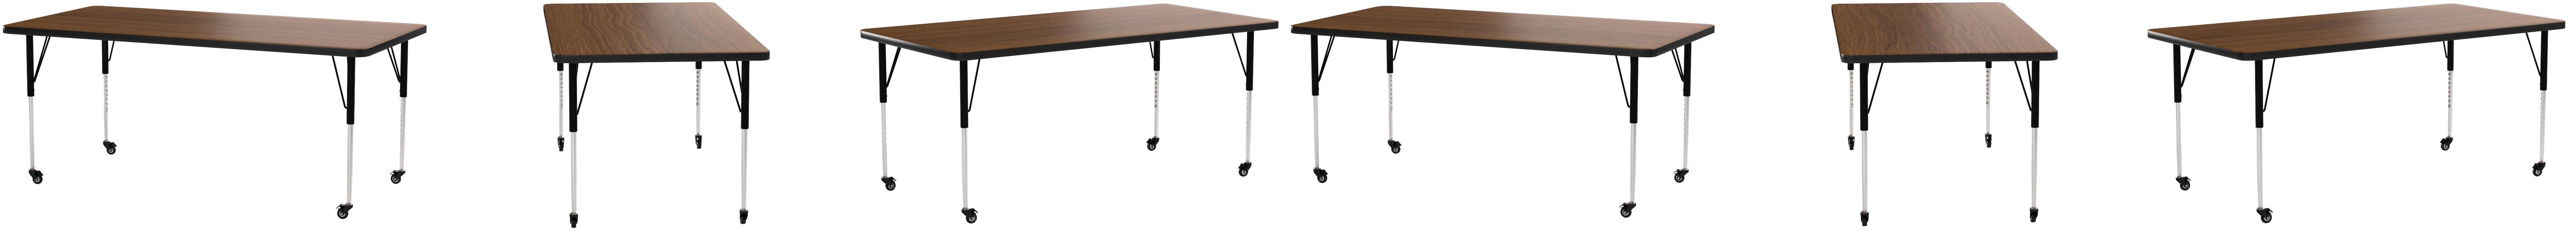 Height Adjustable Short Legs 36 W x 72 D x 17.37-25.37 H StarSun Depot Mobile 36 W x 72 L Rectangular Oak Thermal Laminate Activity Table